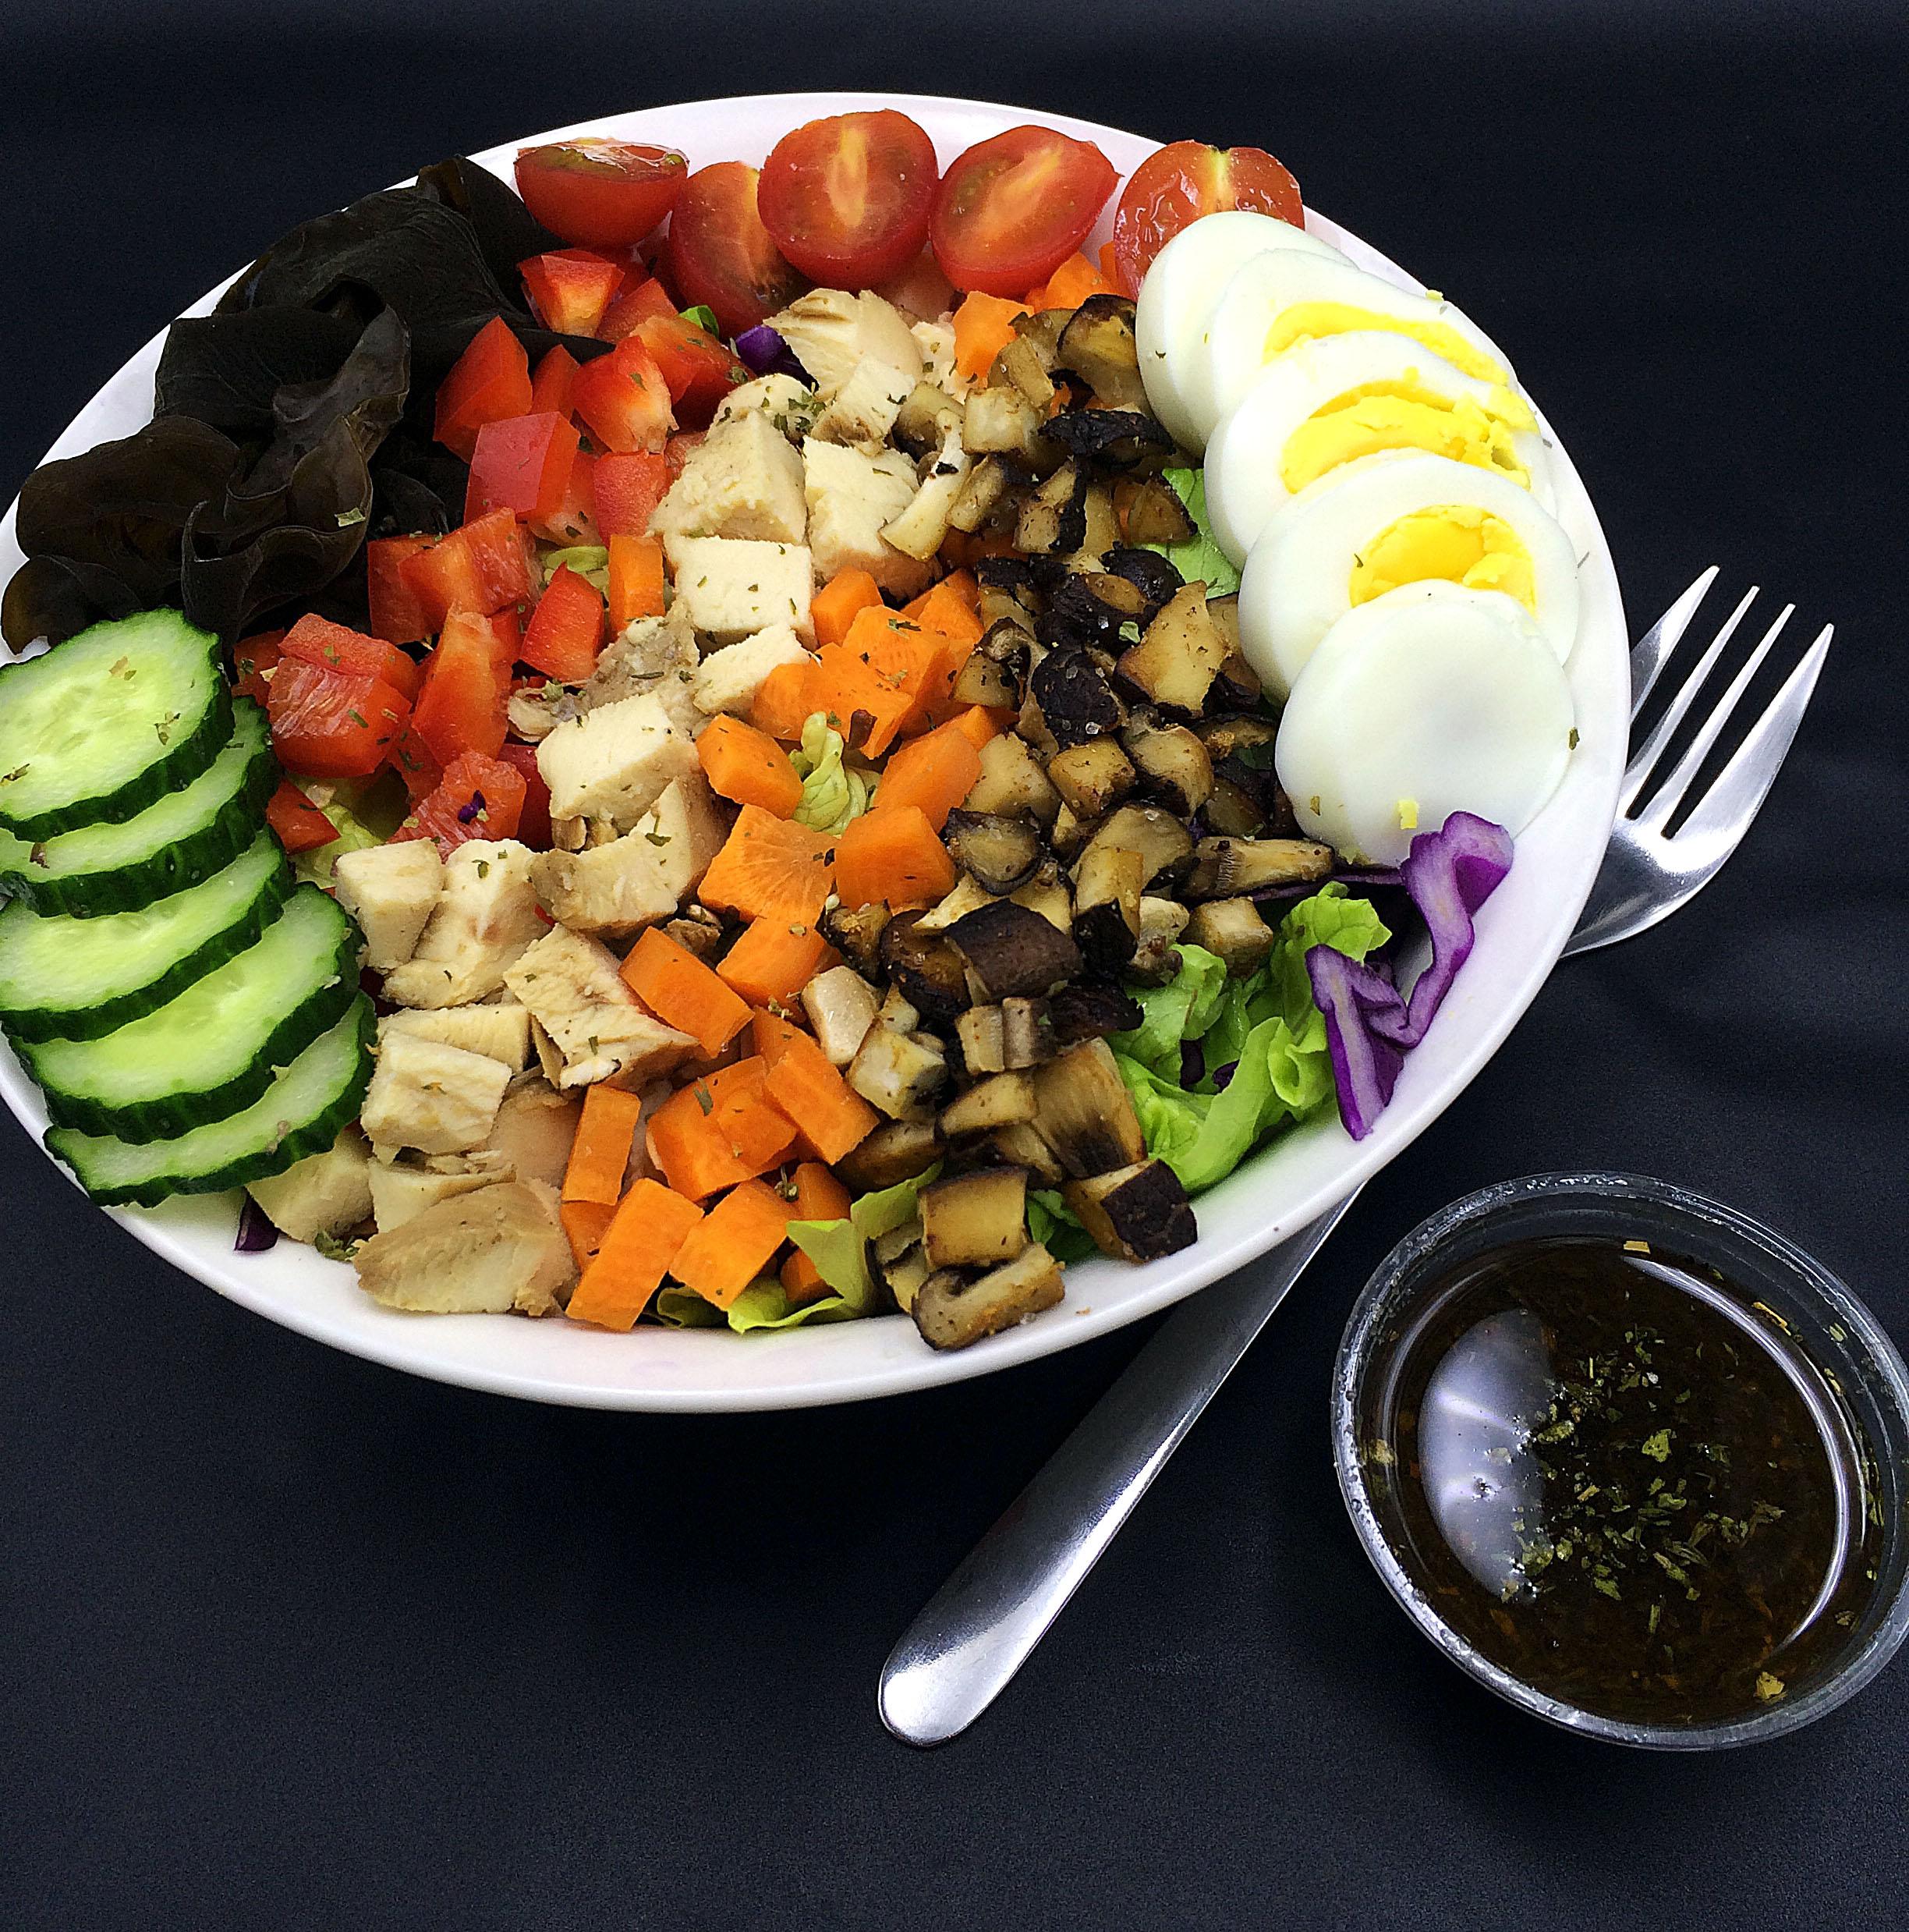 skinny cobb salad (low carb, paleo) / via kitchen-impossible.net #healthy #salad #cobbsalad #paleo #paleorecipe #healthyrecipe #lowfat #highprotein